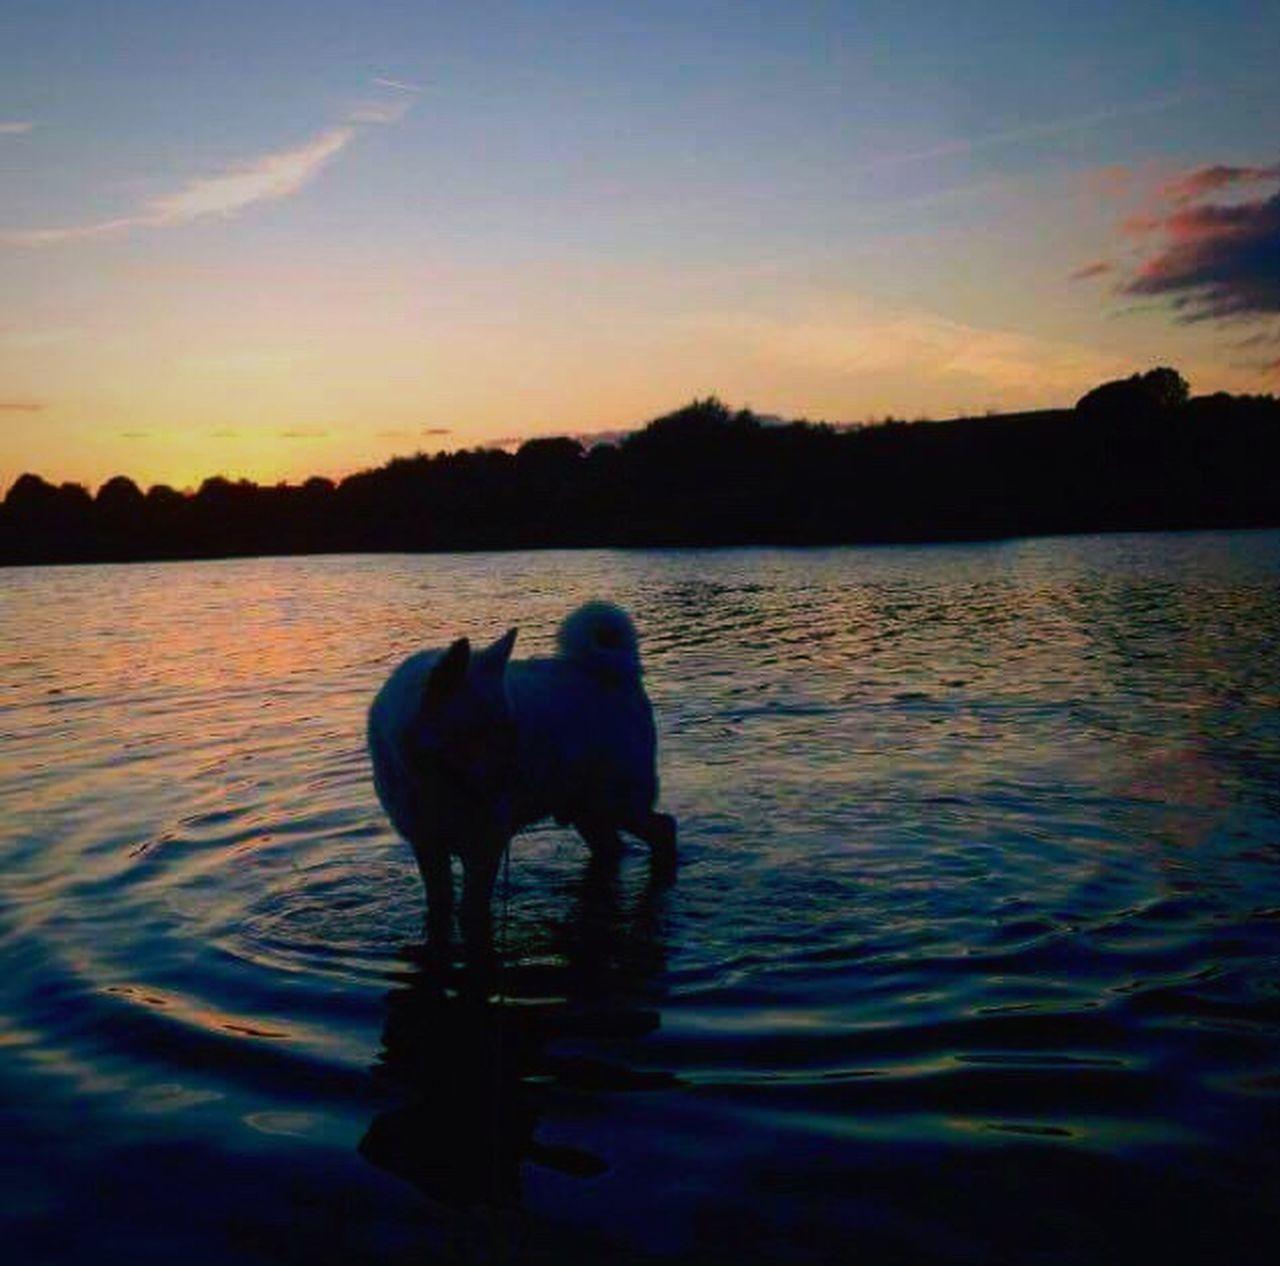 Simba ❤️ Tranquil Scene Sunset Water Animal Themes One Animal Dog Cute Pets Lake Animals Nature Animal Photography Domestic Animals Sky Animal Love Mammal Akita Pets Beauty In Nature No People Day